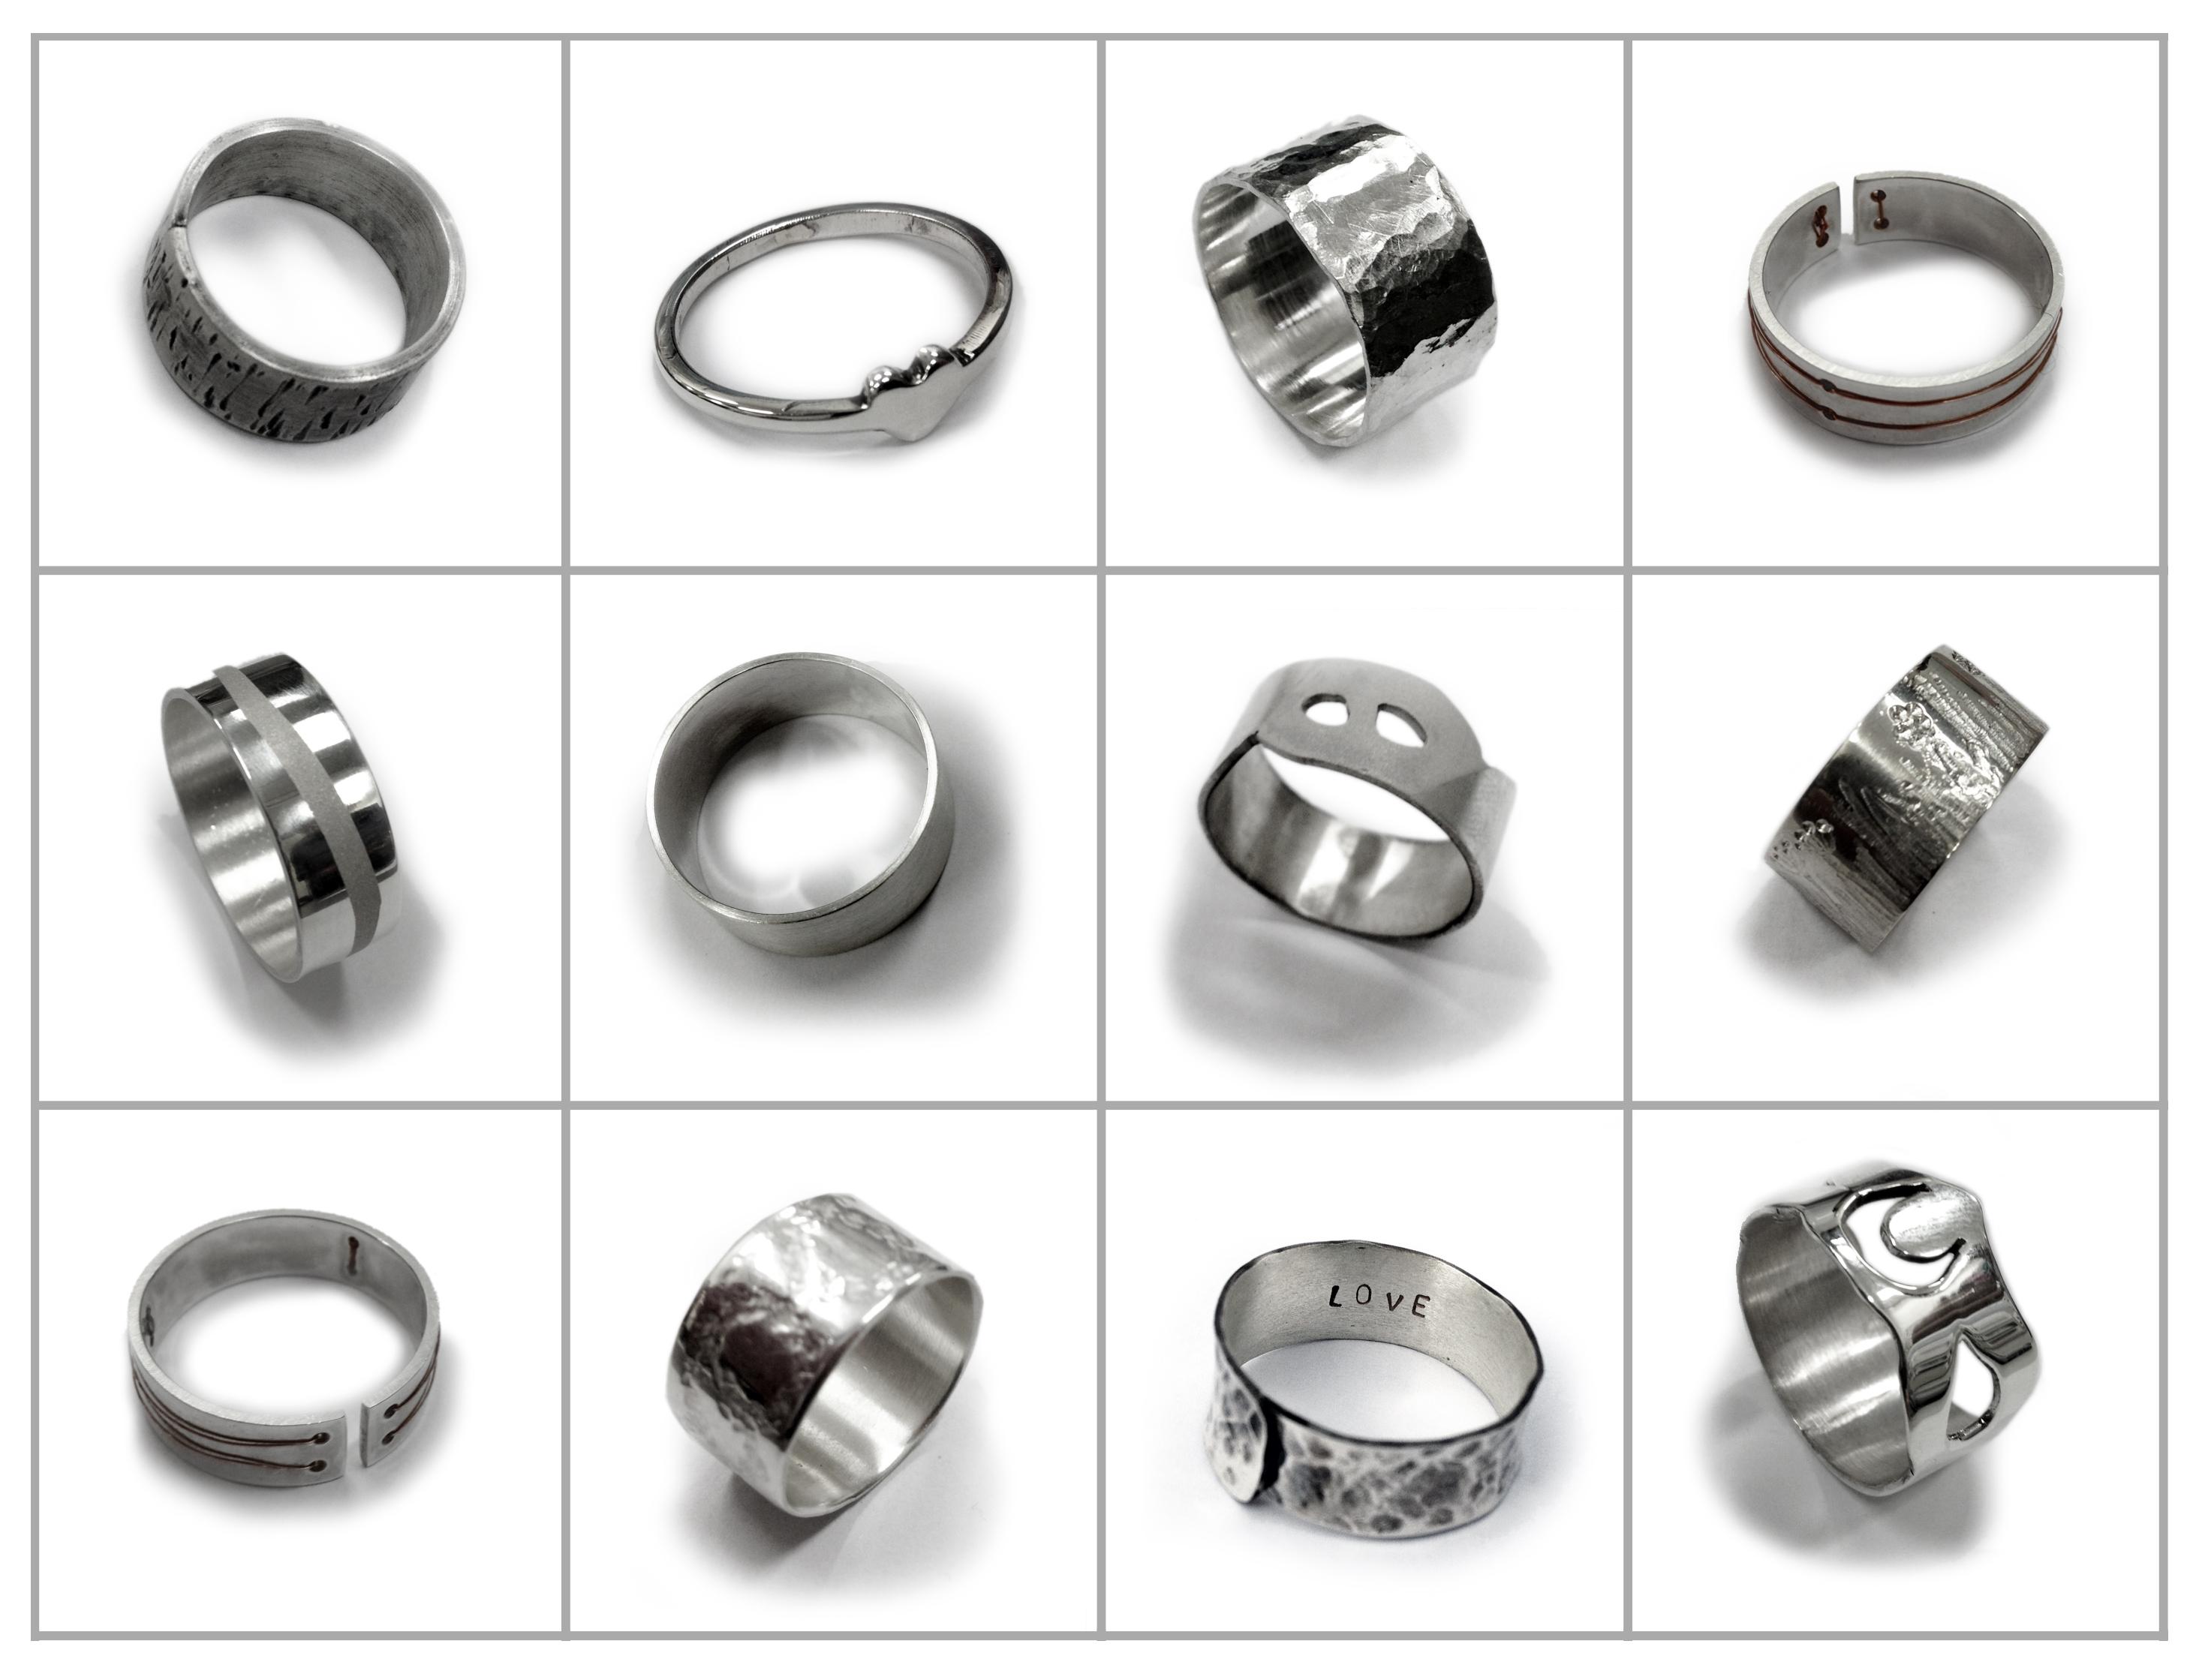 Ring workshop image.jpg